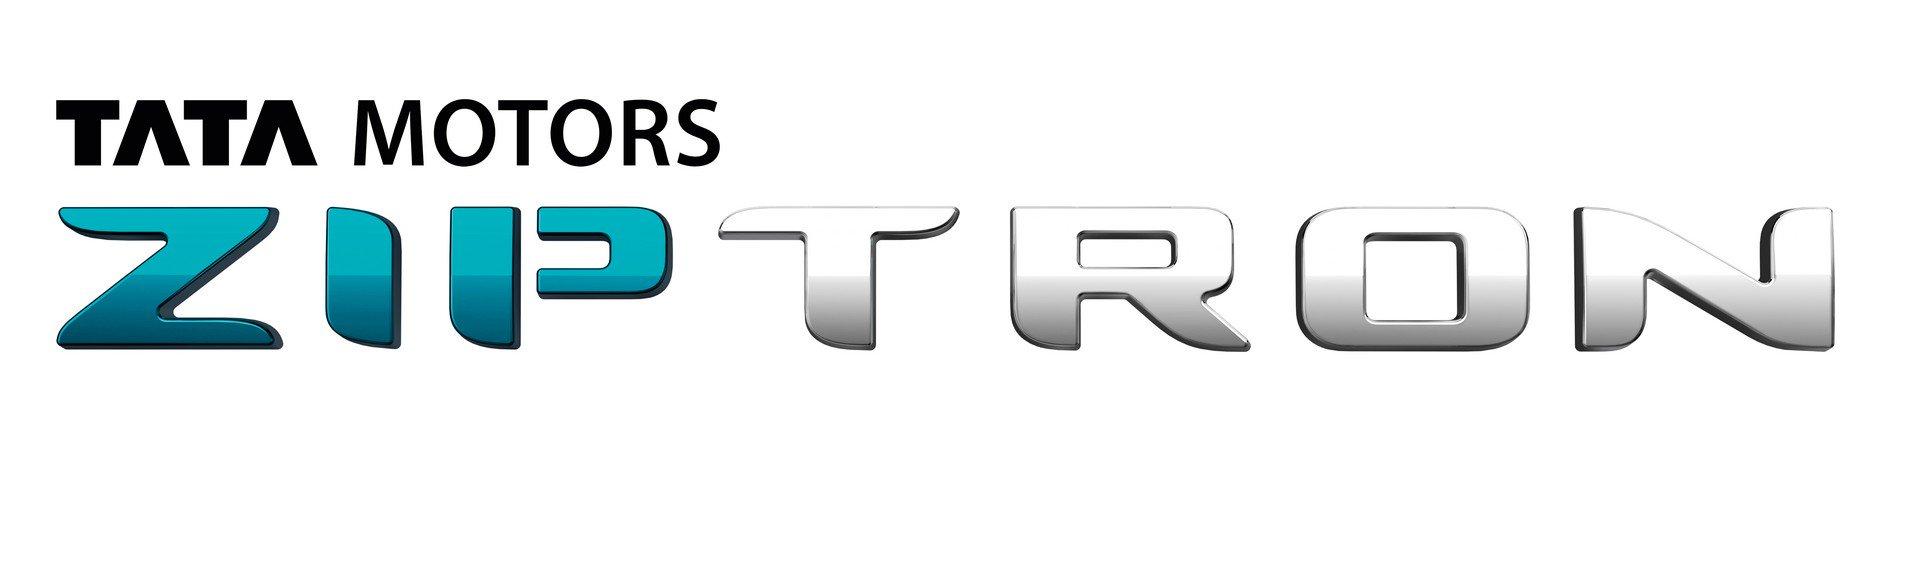 Tata-Ziptron-6